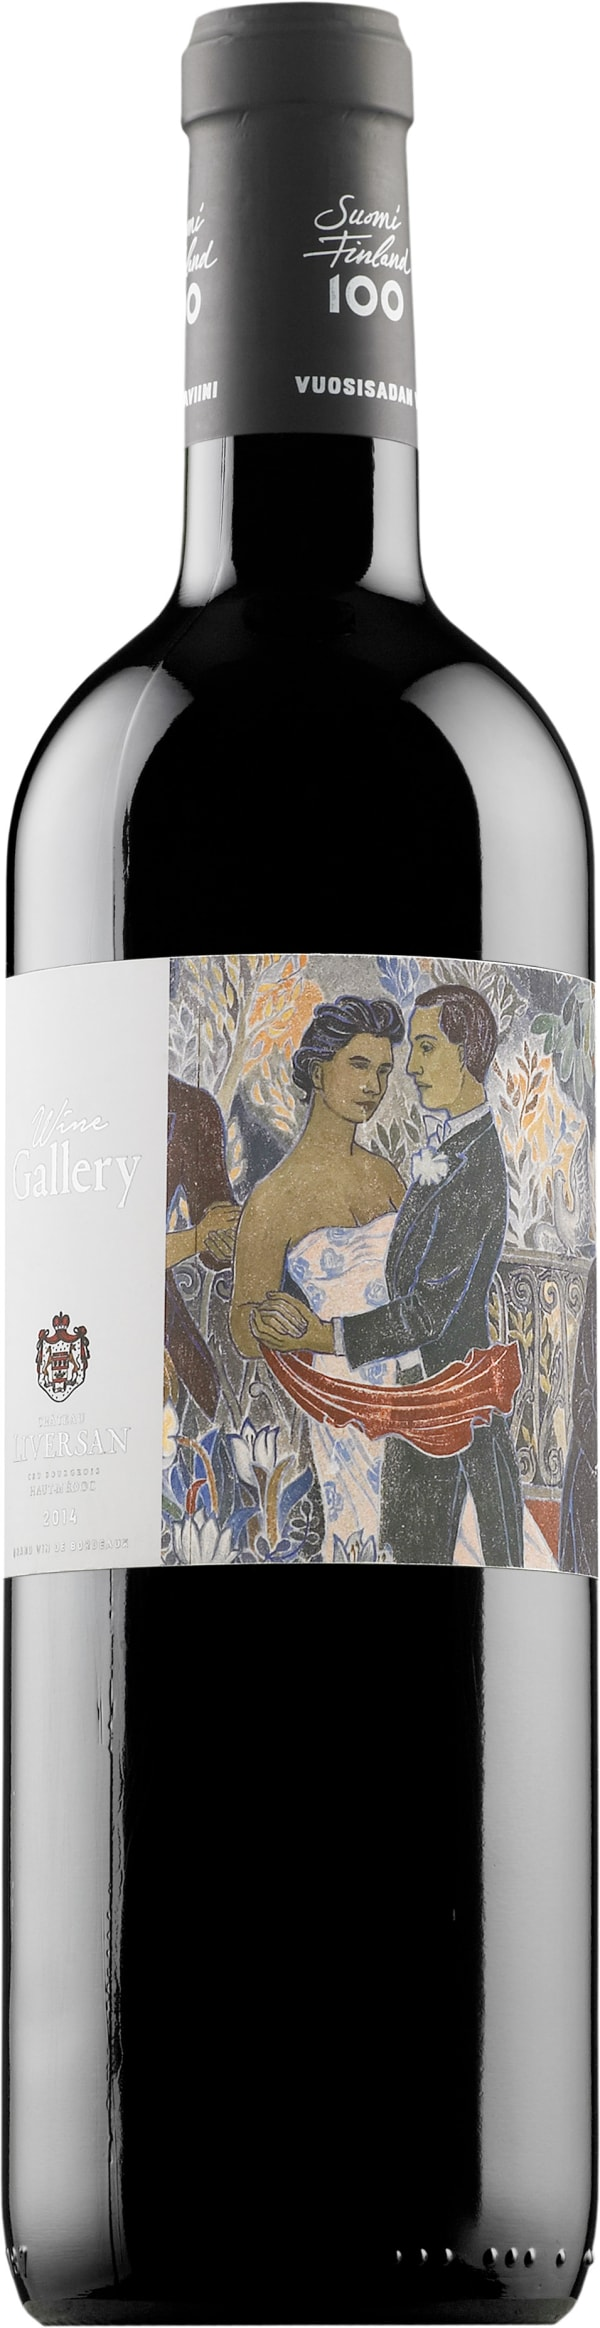 Wine Gallery Suomi Finland 100 Bordeaux Rouge 2014